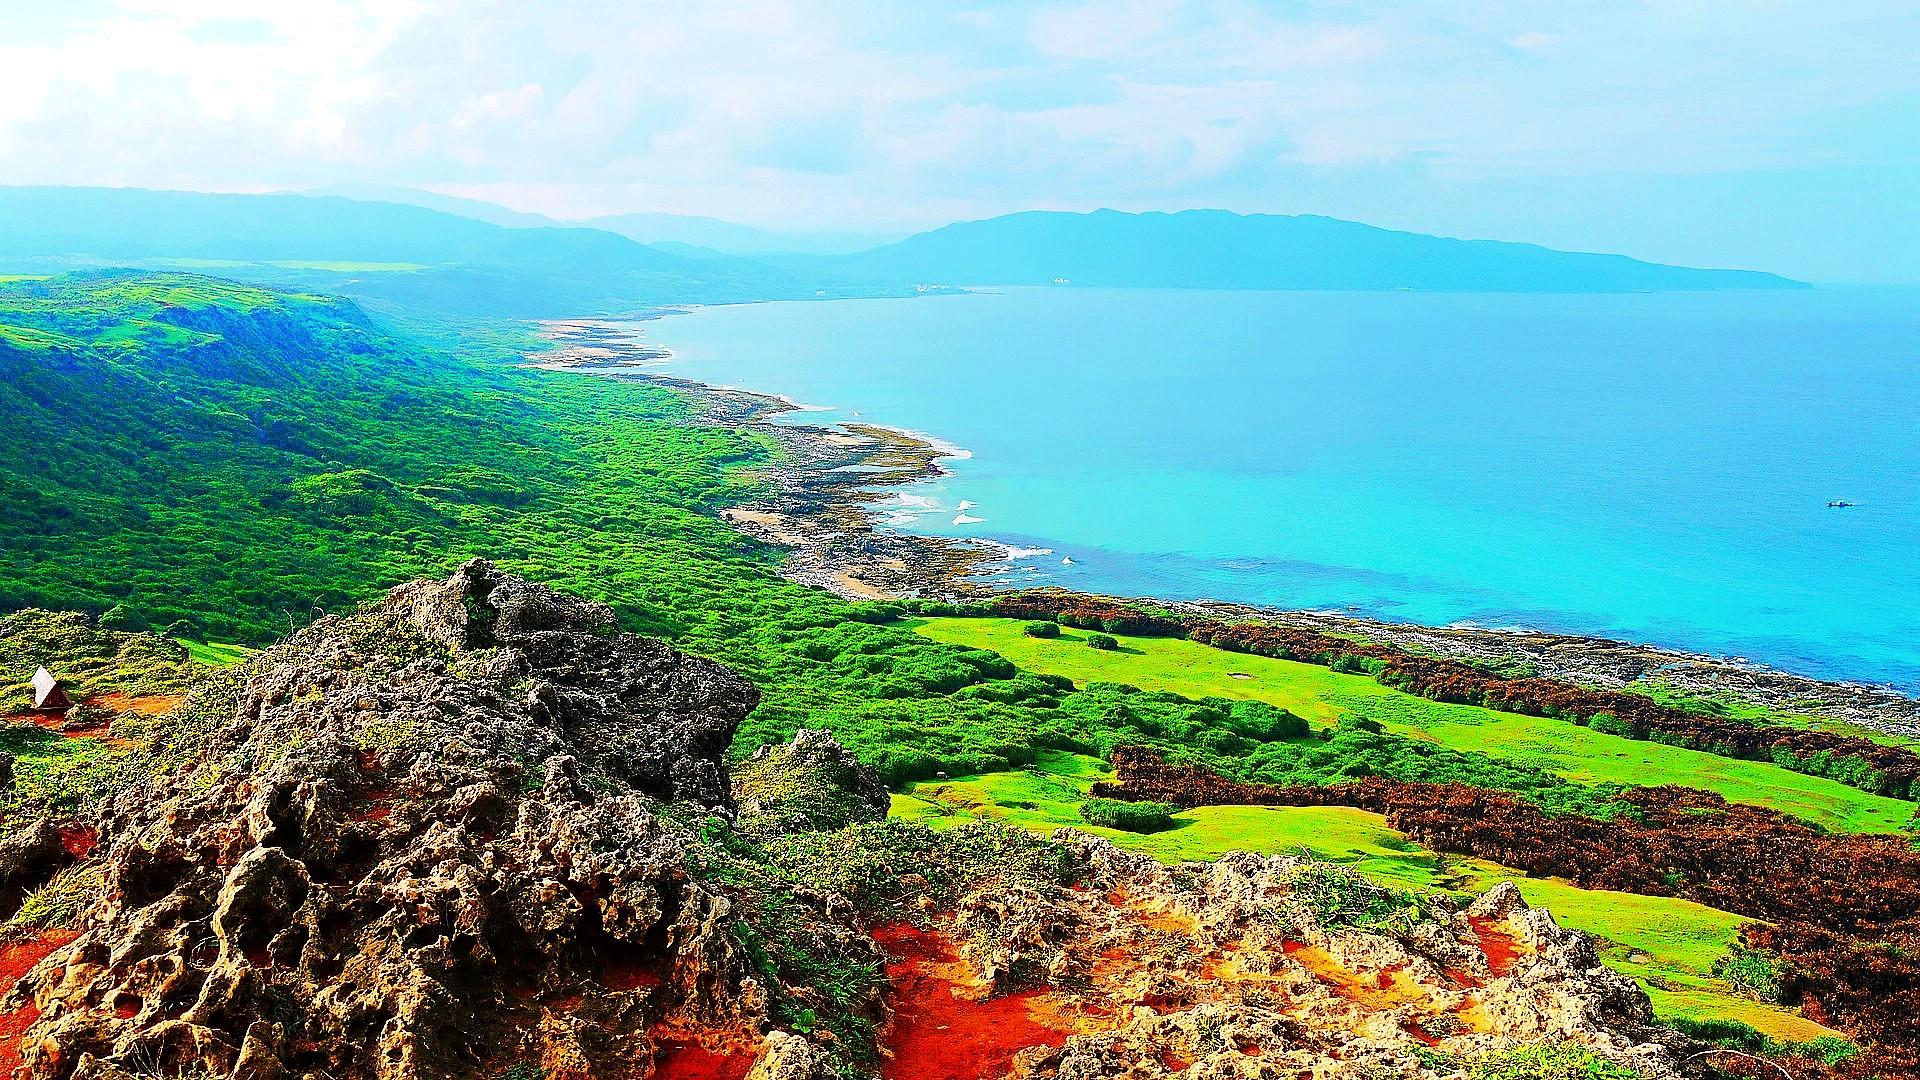 National-Park-Kenting-Beach-Taiwan